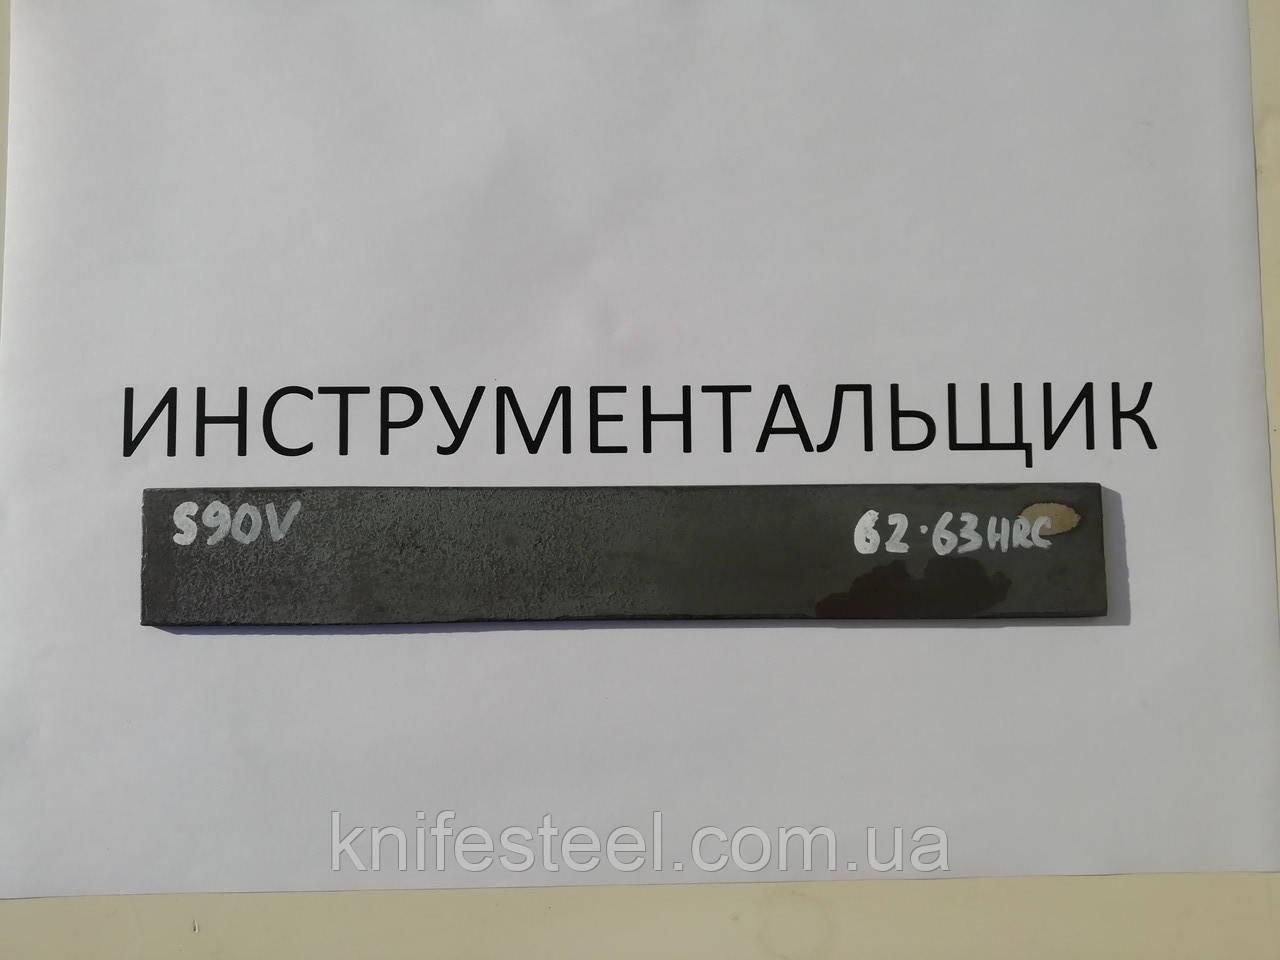 Заготовка для ножа сталь CPM S90V 219-220х30х3 мм термообработка (62-63 HRC)